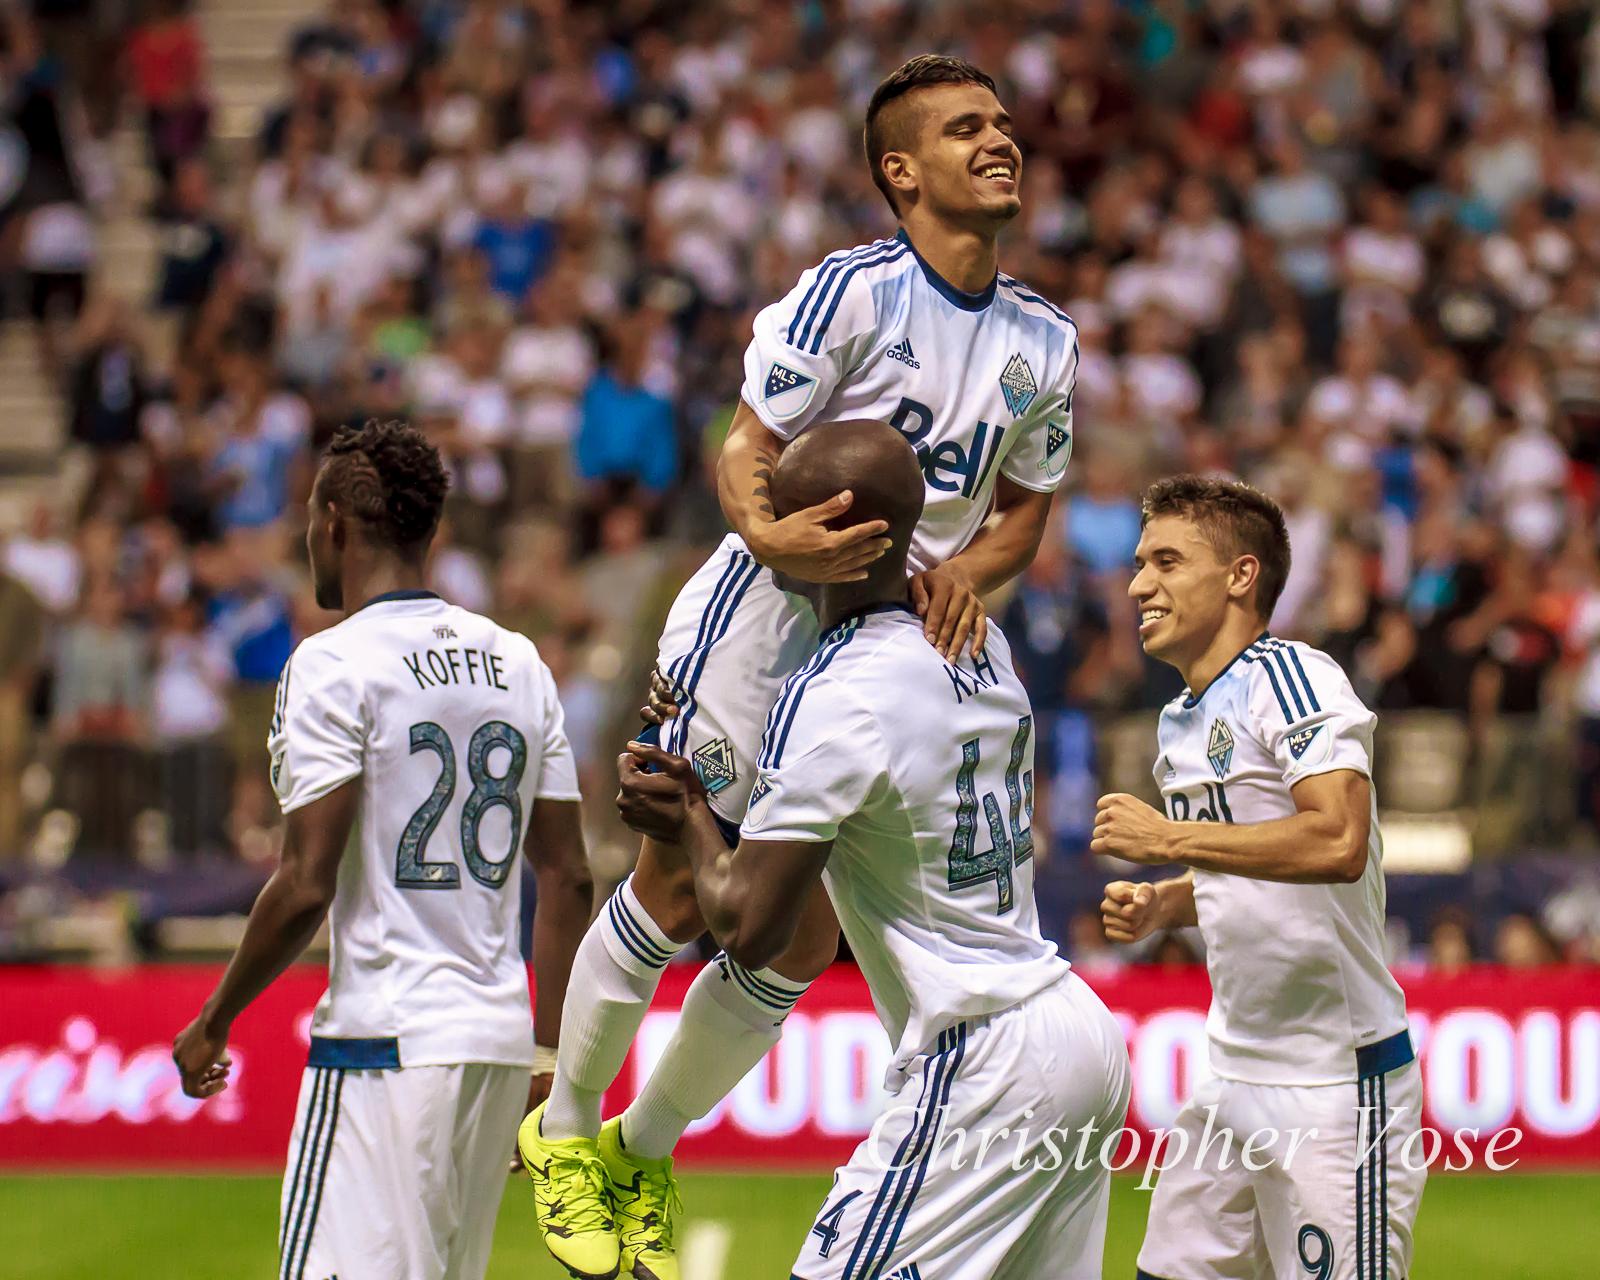 2015-08-08 Cristian Techera's First Goal Celebration 2.jpg